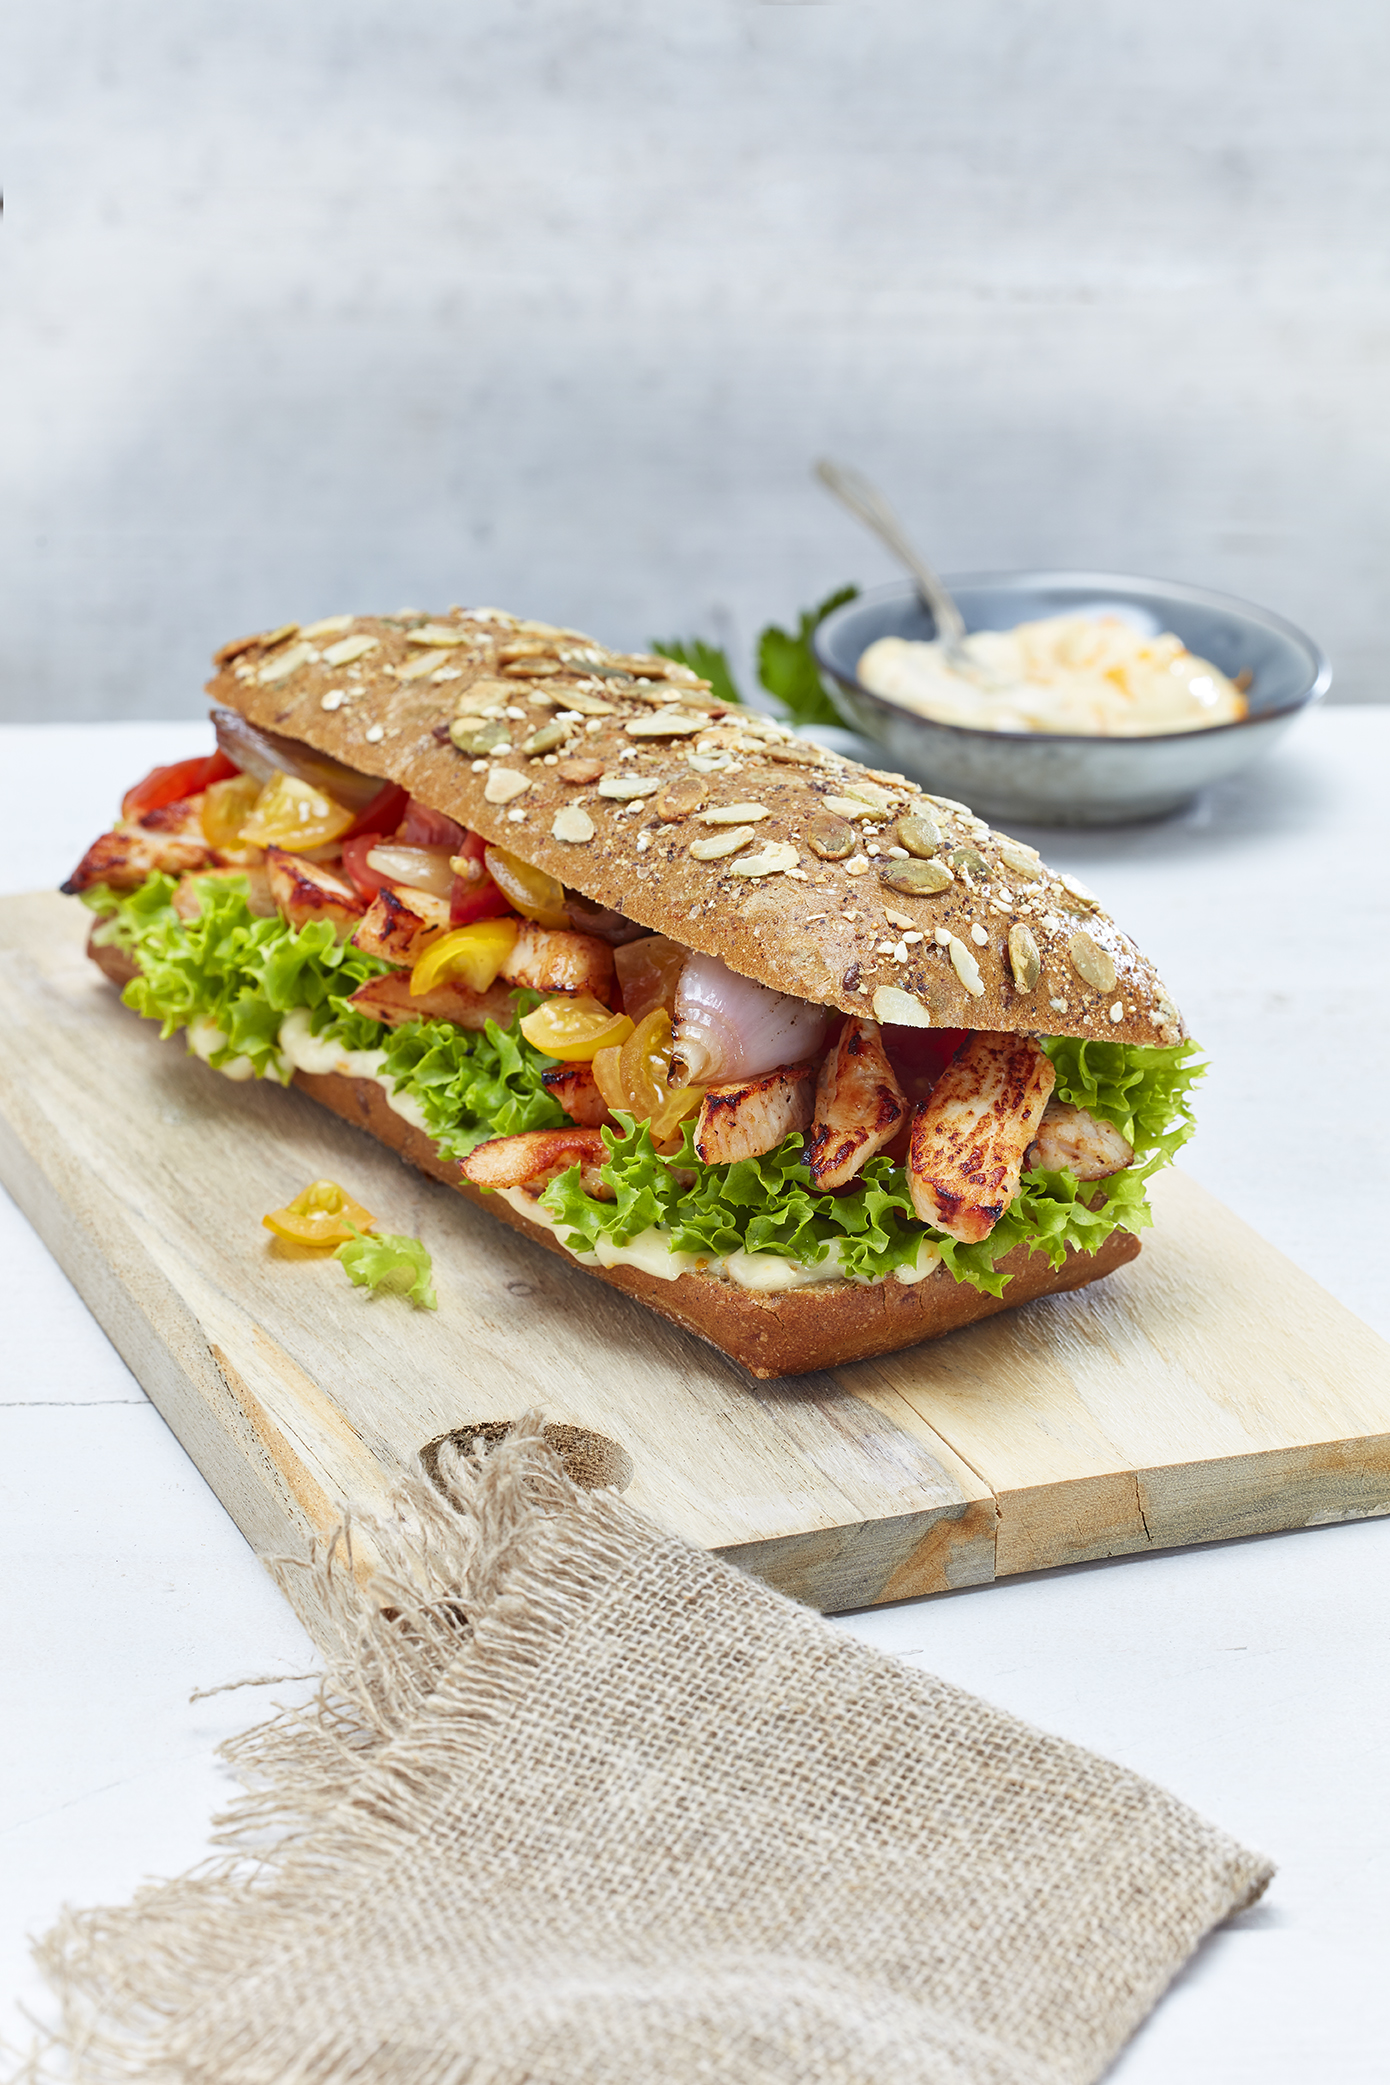 OSI_Foodworks_Sandwich_Haehnchenbruststreifen